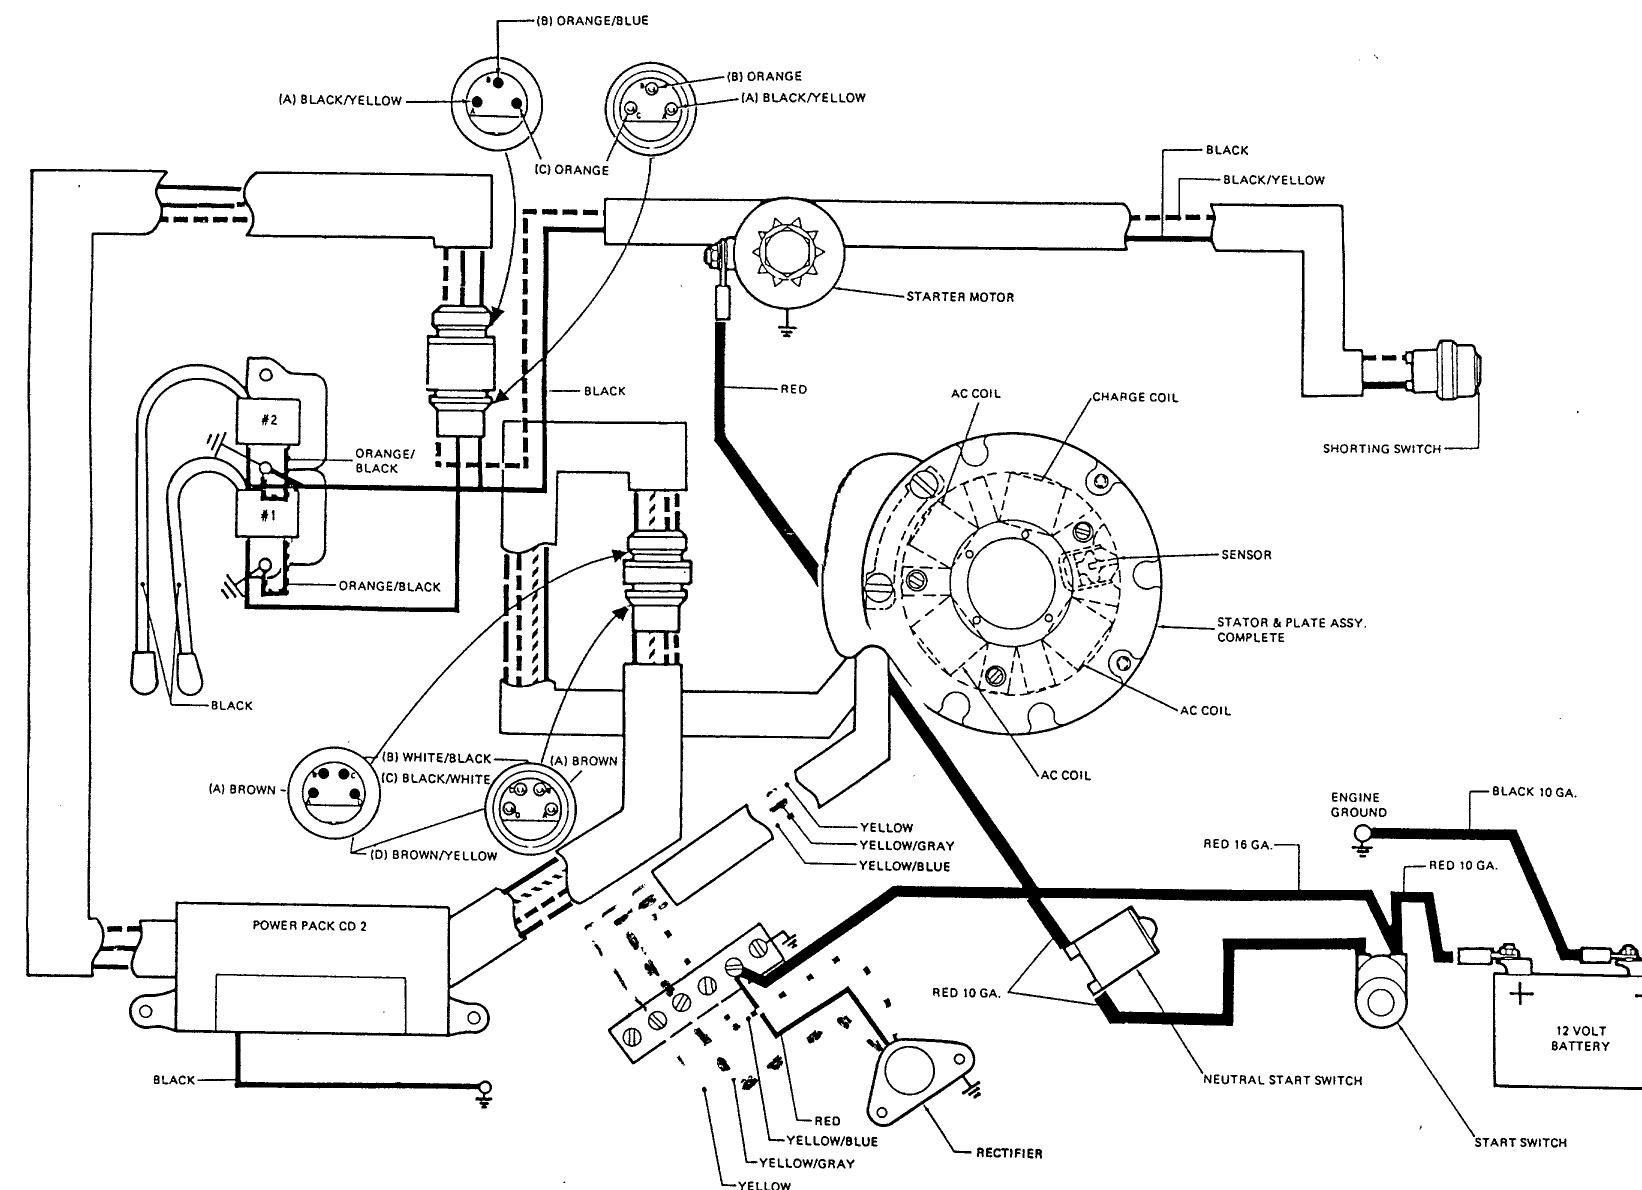 Diagram 1988 Johnson 9 Hp Outboard Parts Diagram Wiring Full Version Hd Quality Diagram Wiring Diagramsloop Csarcheometria It